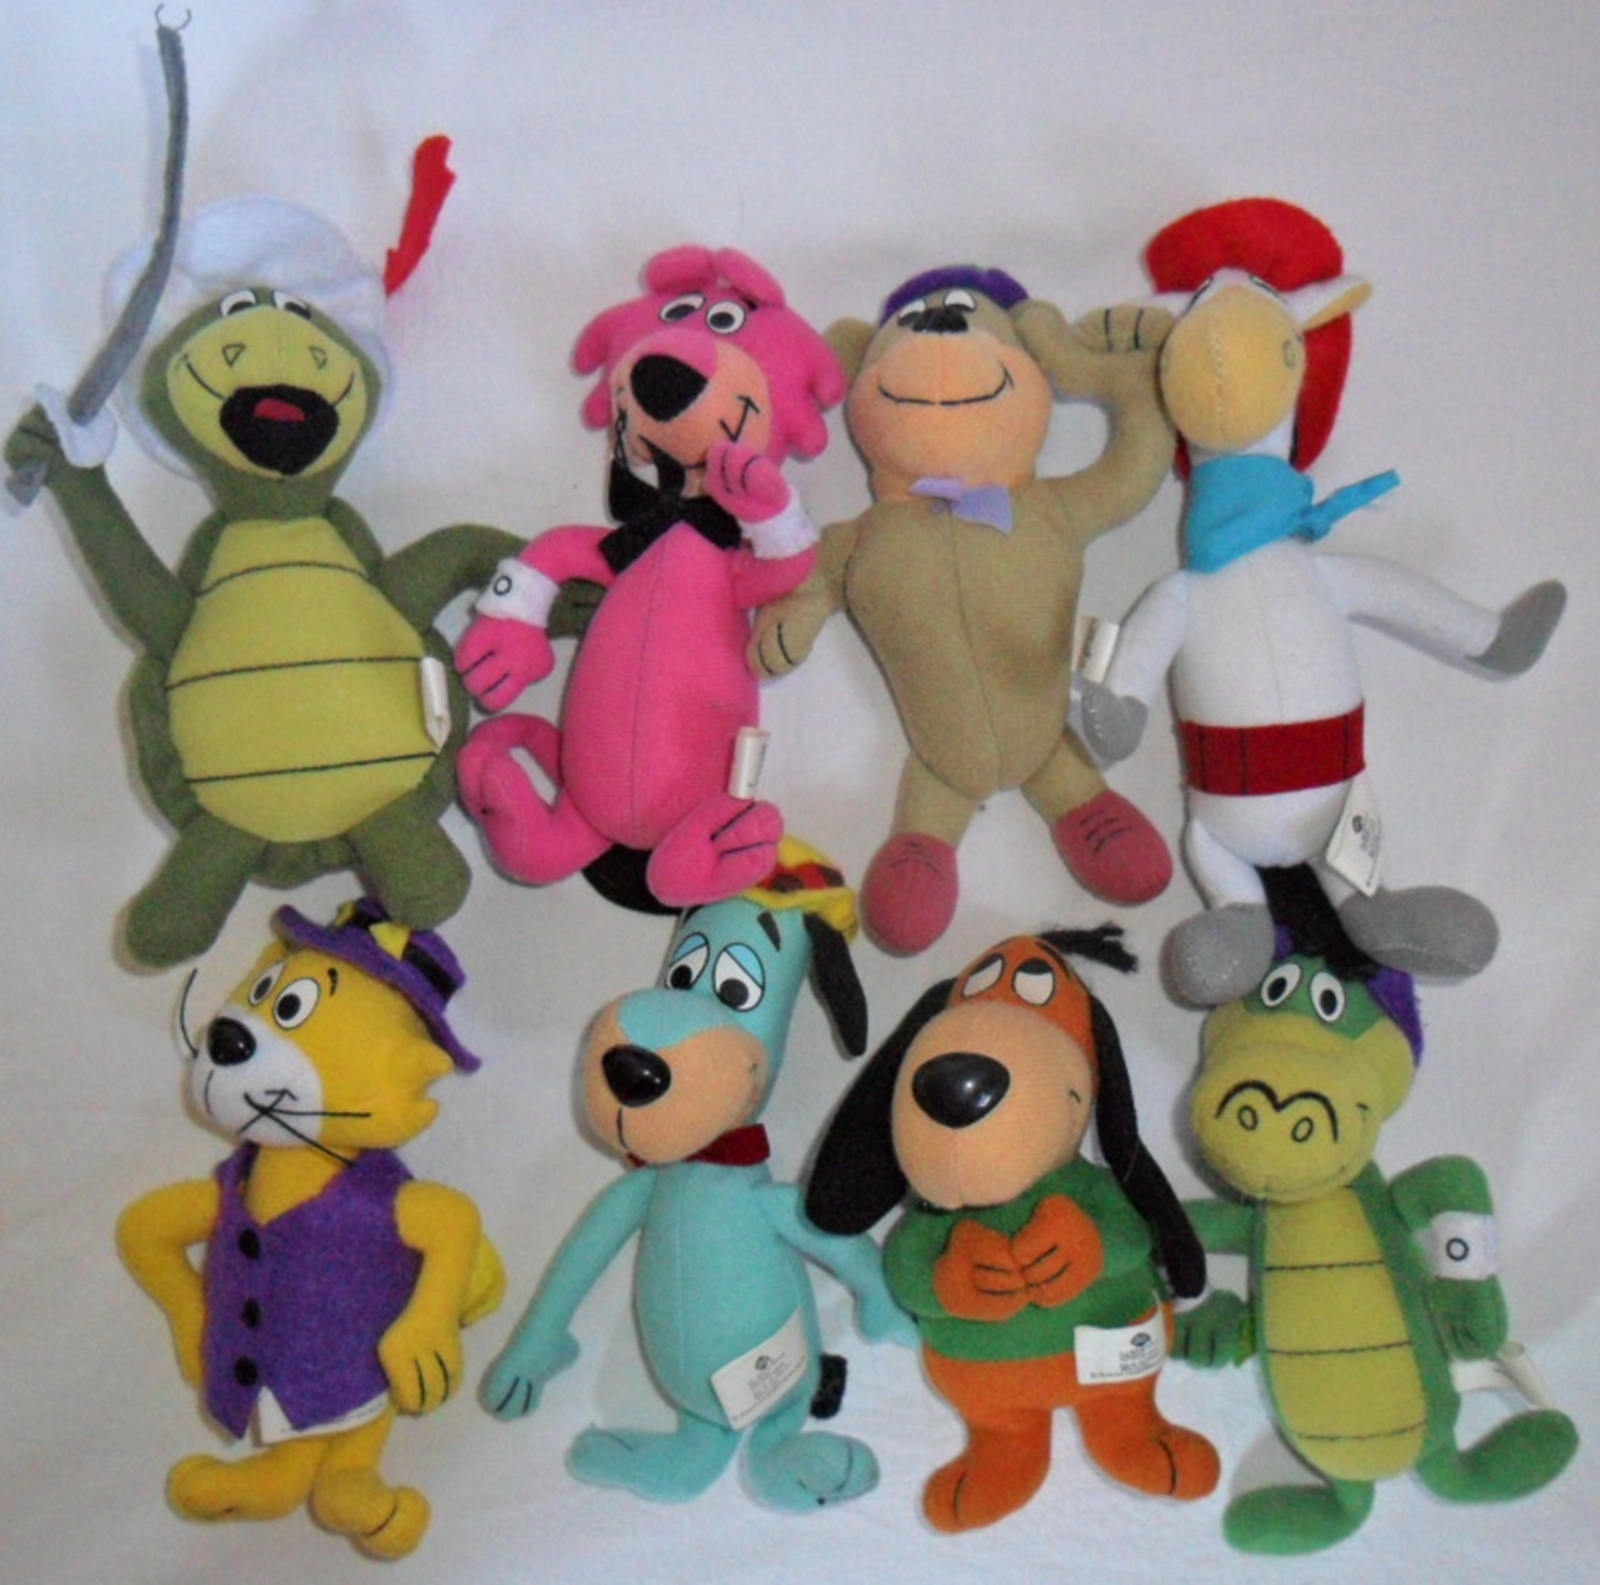 Treasure Toys Cartoon : Treasures in thrifting land july